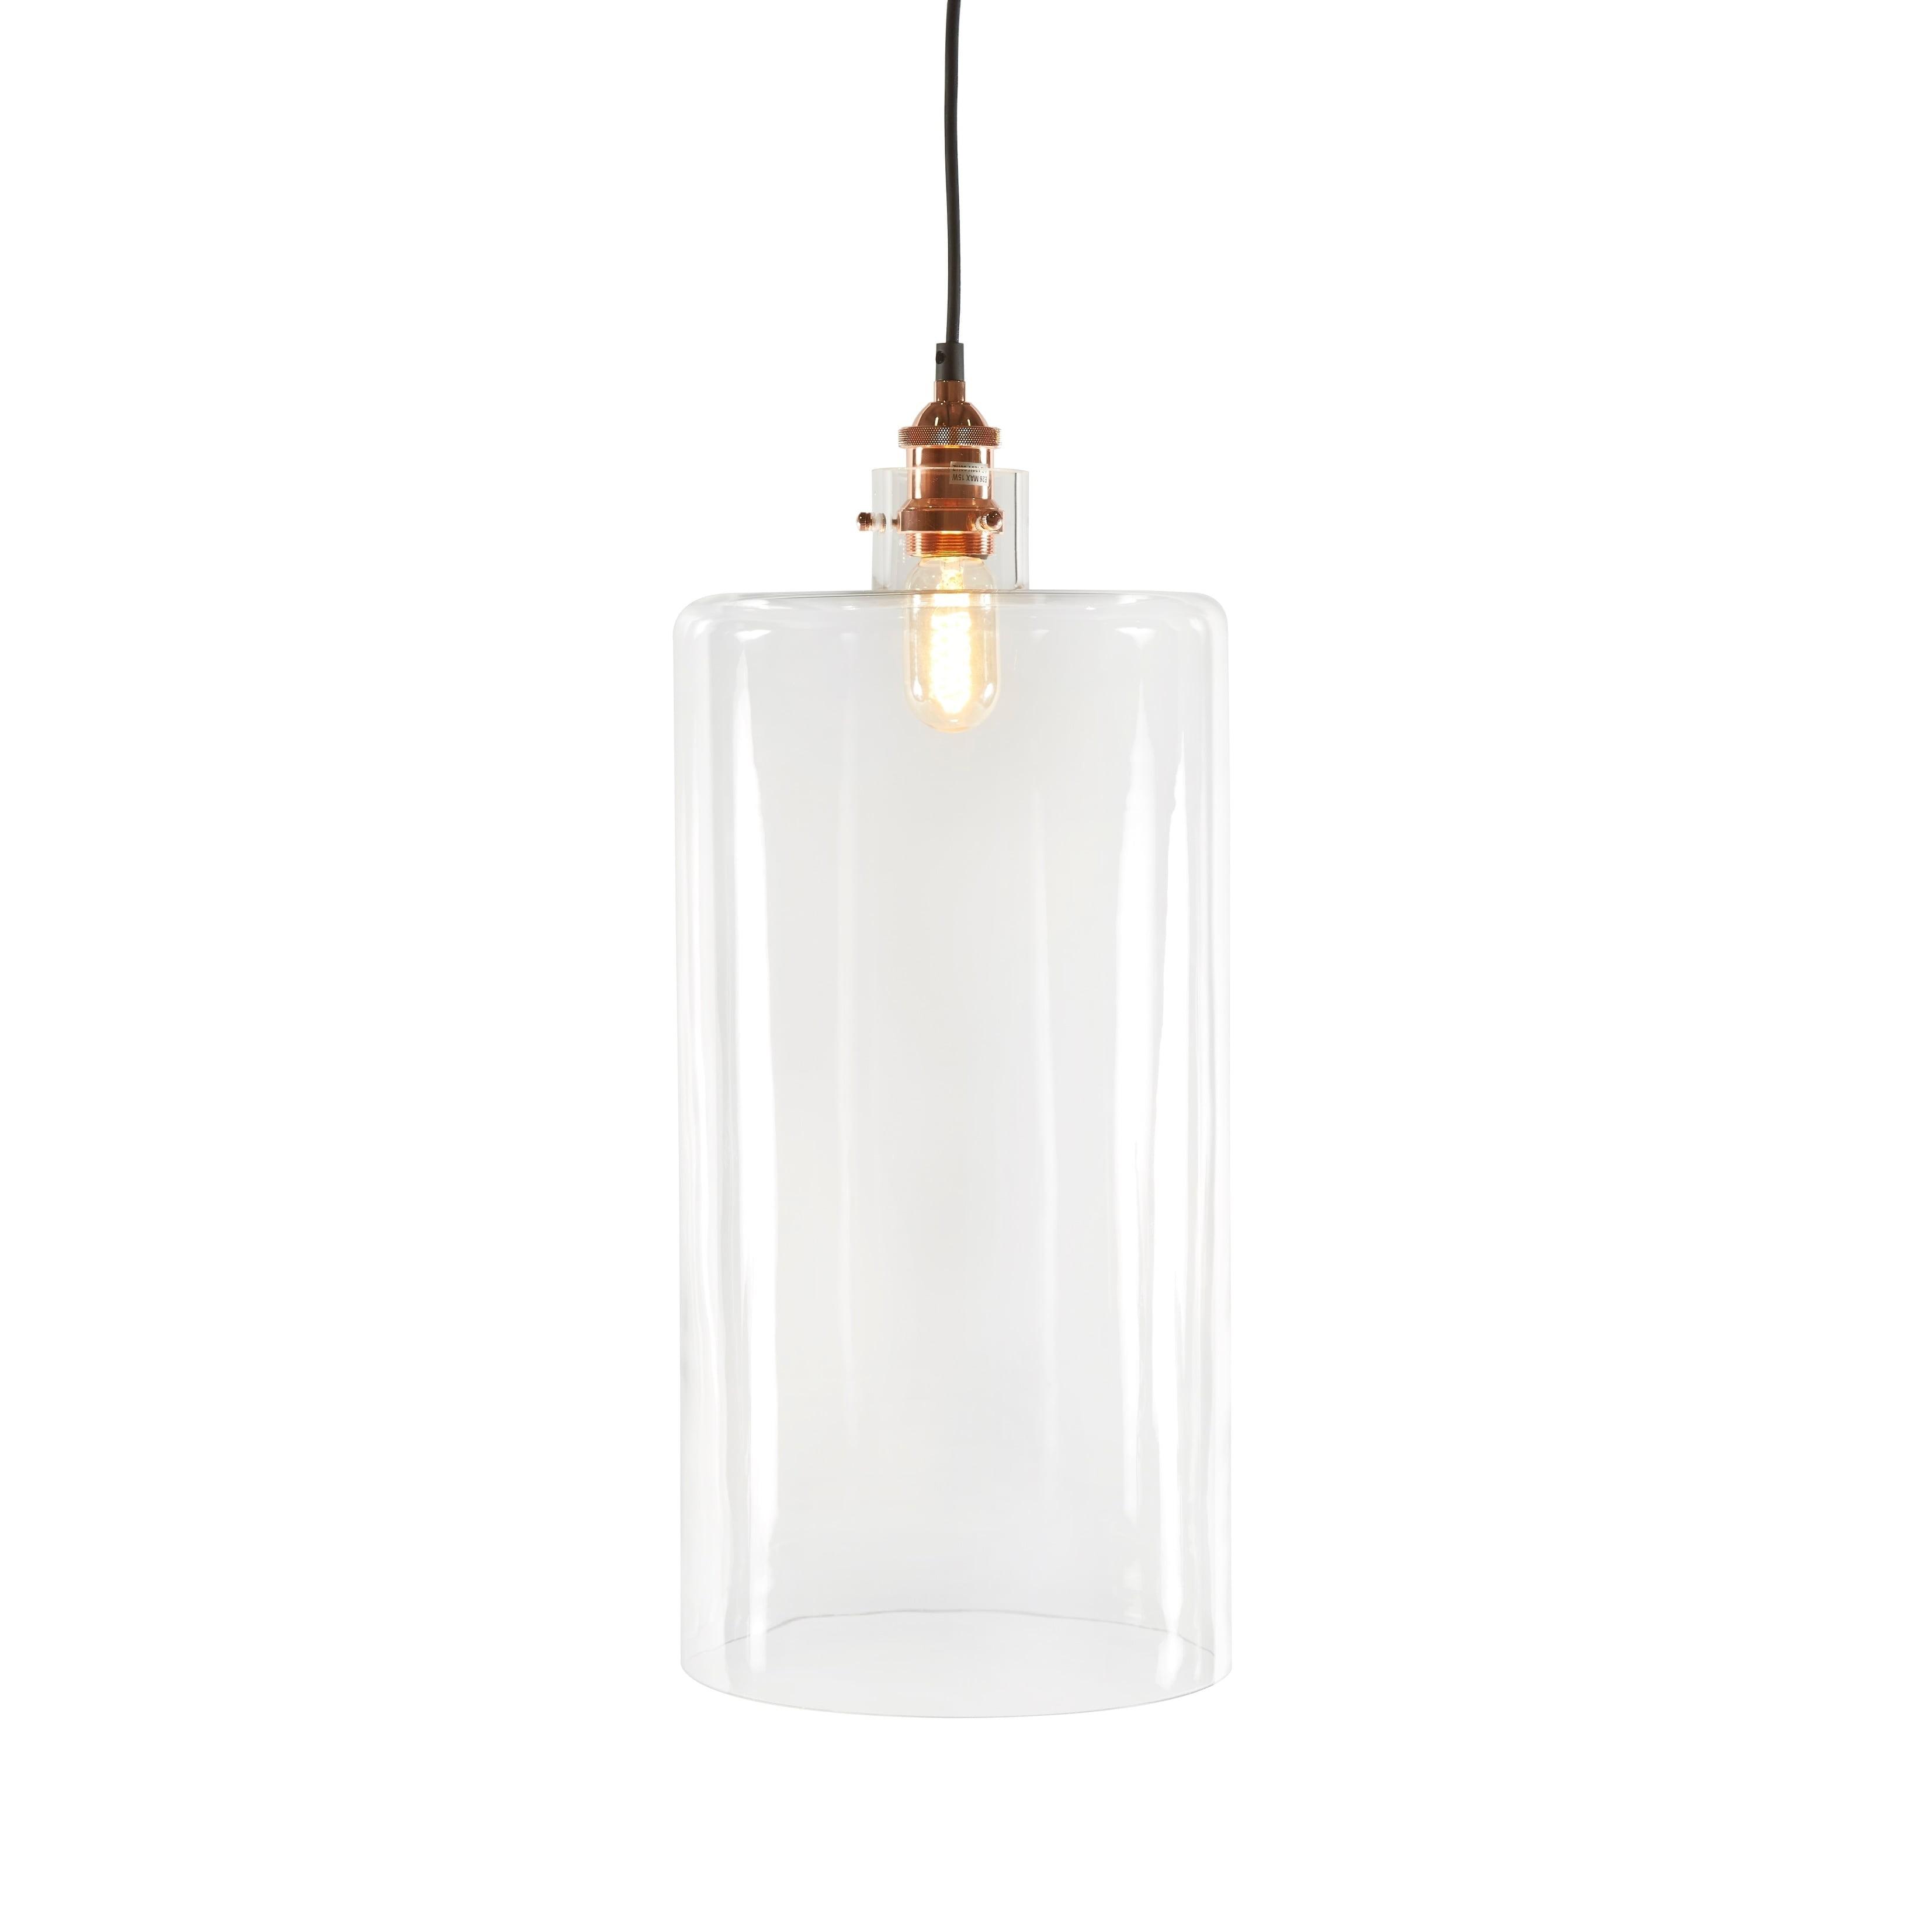 Cdi international furniture tucson la1304a glass pendant light walmart com